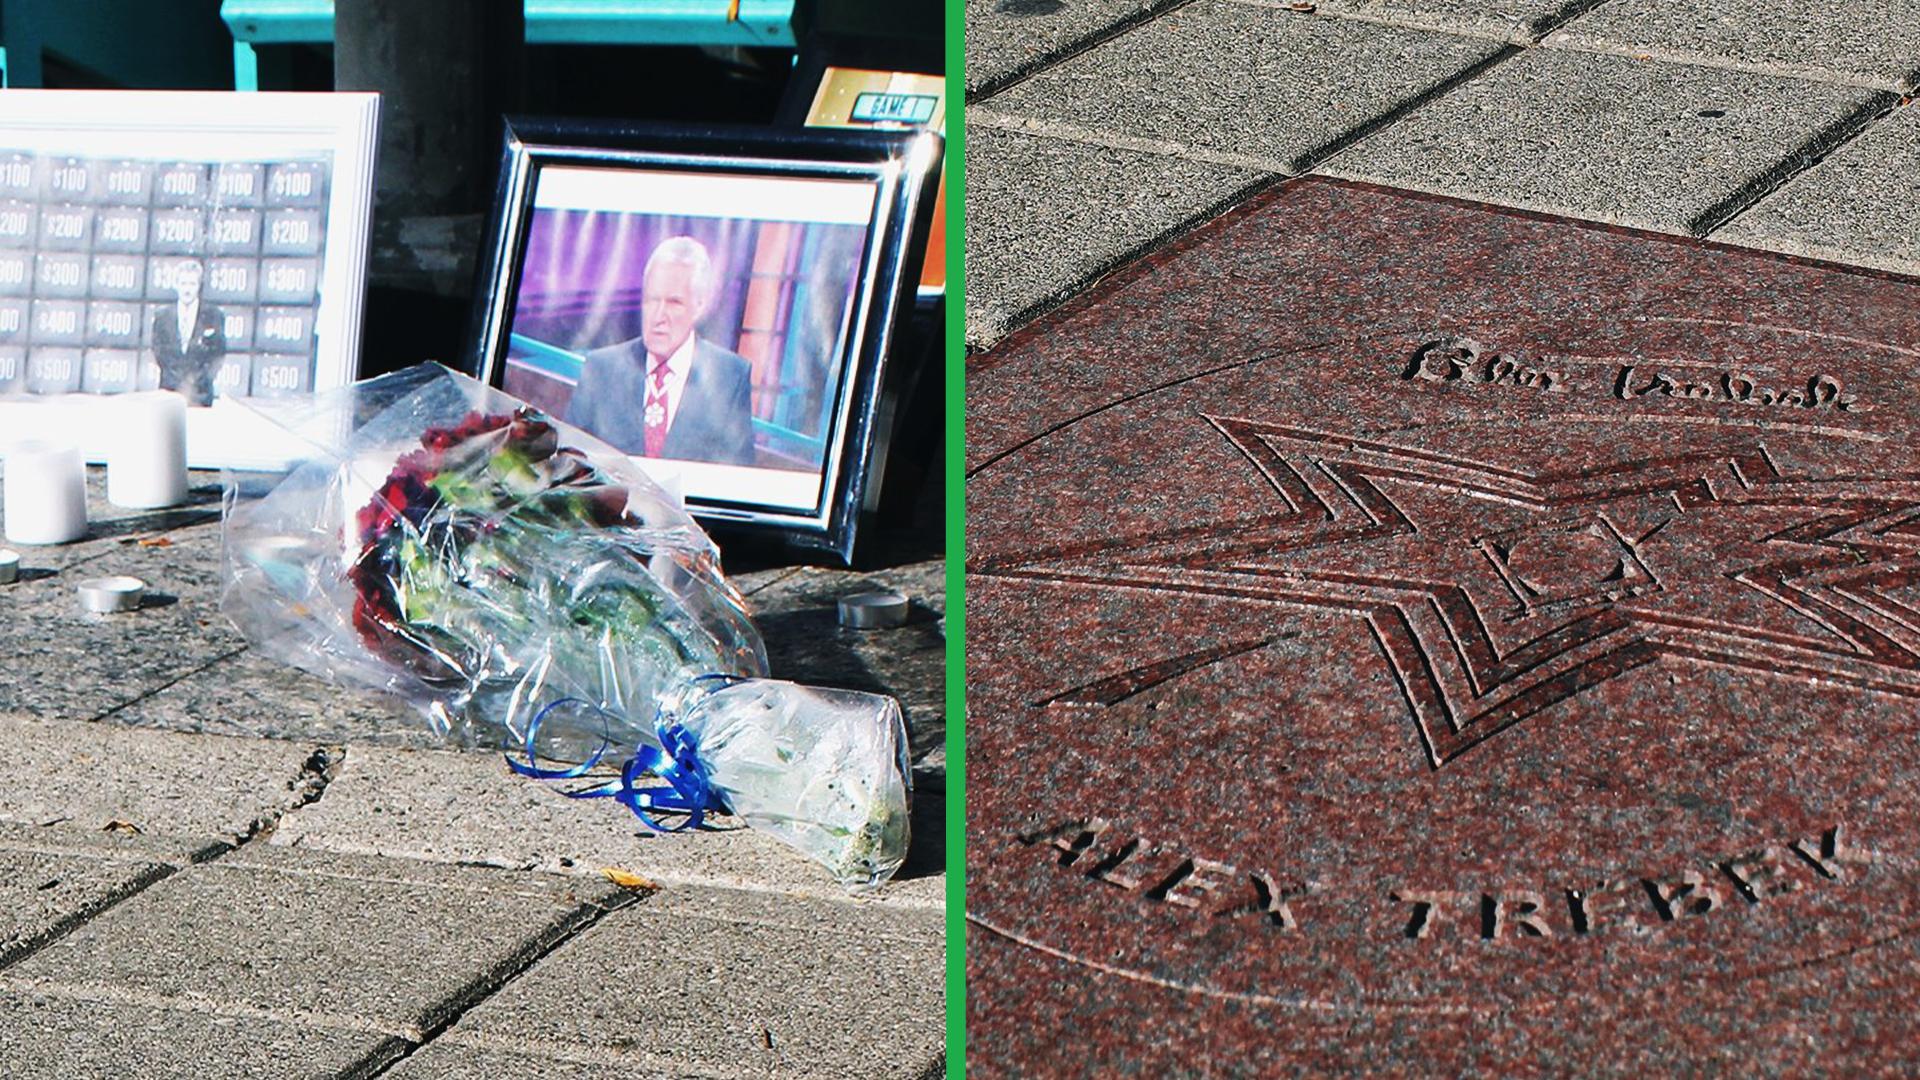 Toronto honours Canadian legend Alex Trebek with mini memorial